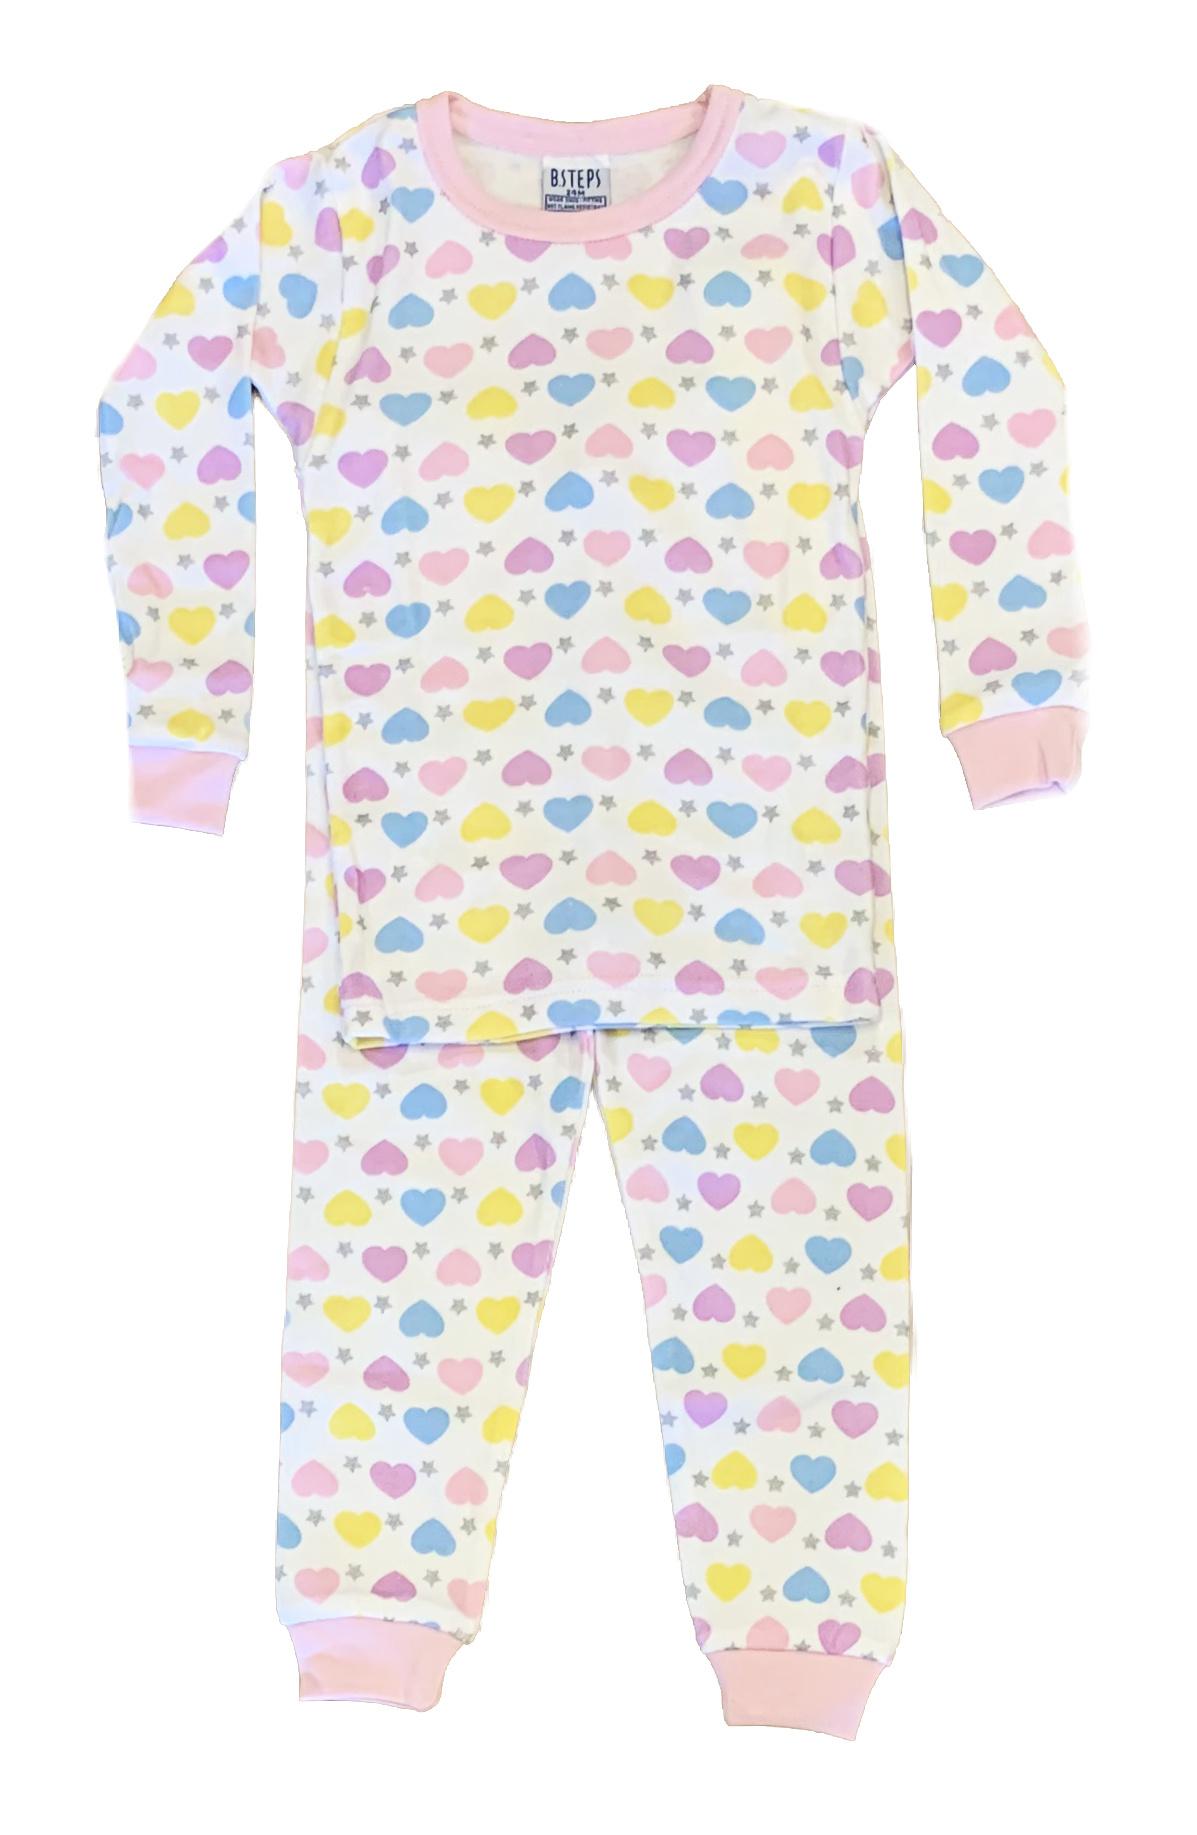 Baby Steps Hearts & Stars PJ Set